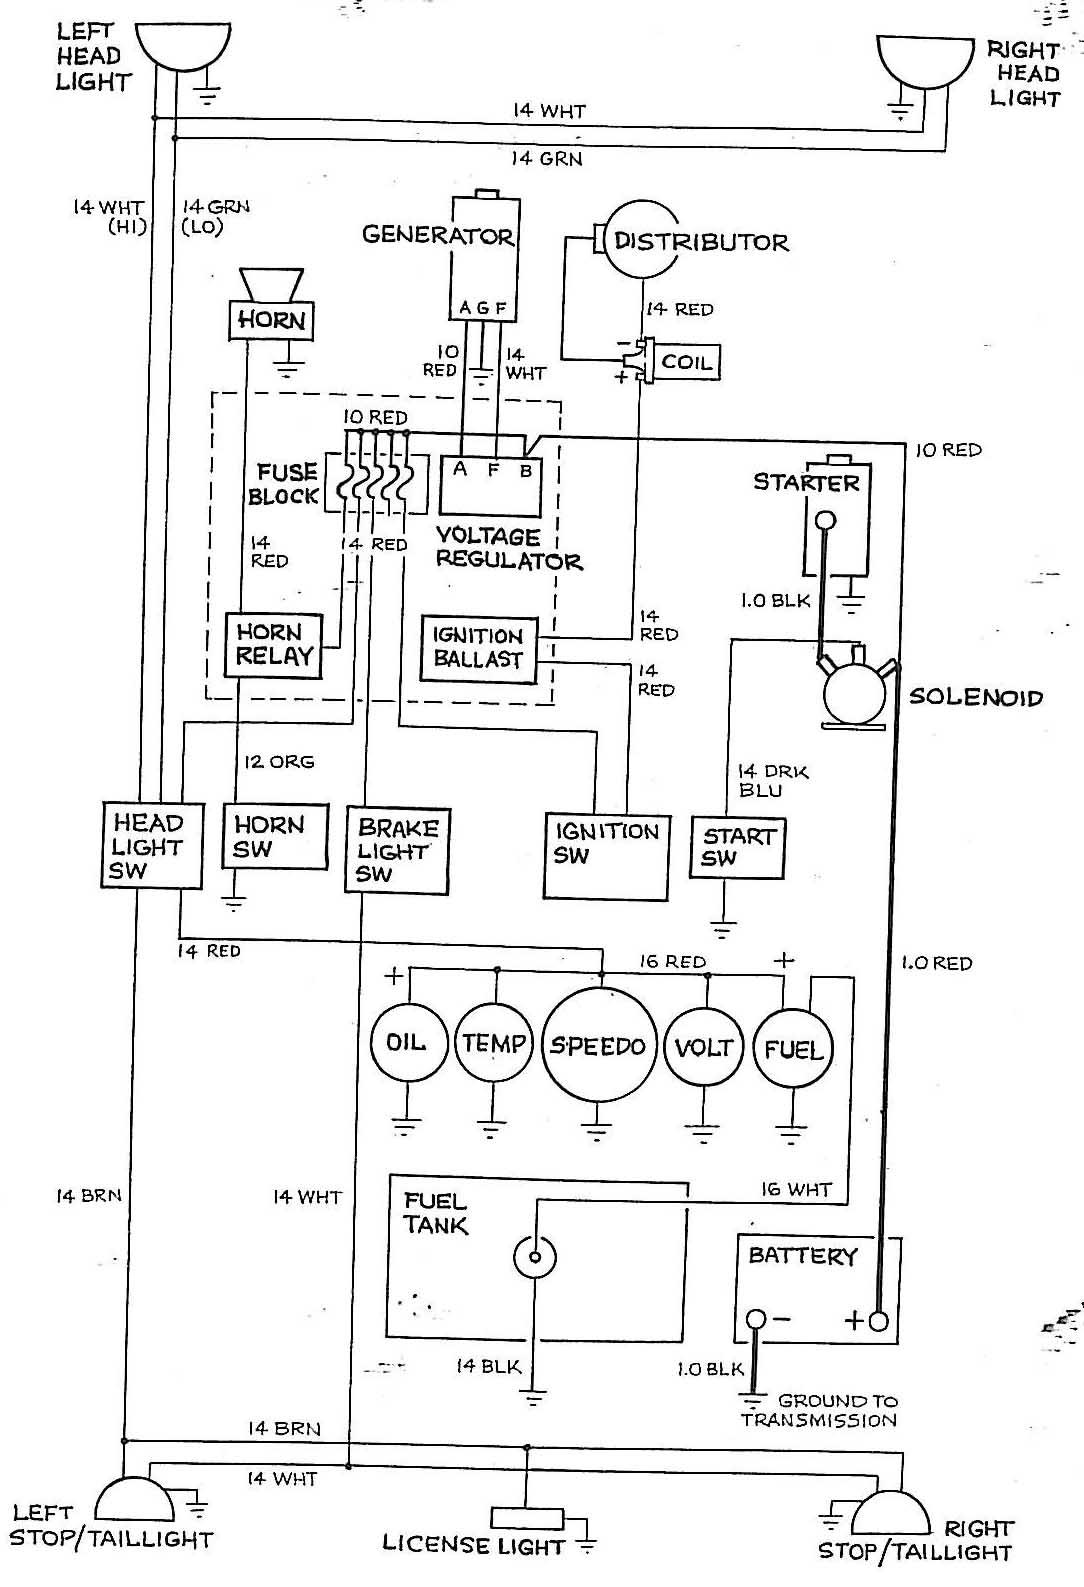 Farmall Super C Wiring Diagram From 6v To 12v Sailboat Wiring Fuse Box